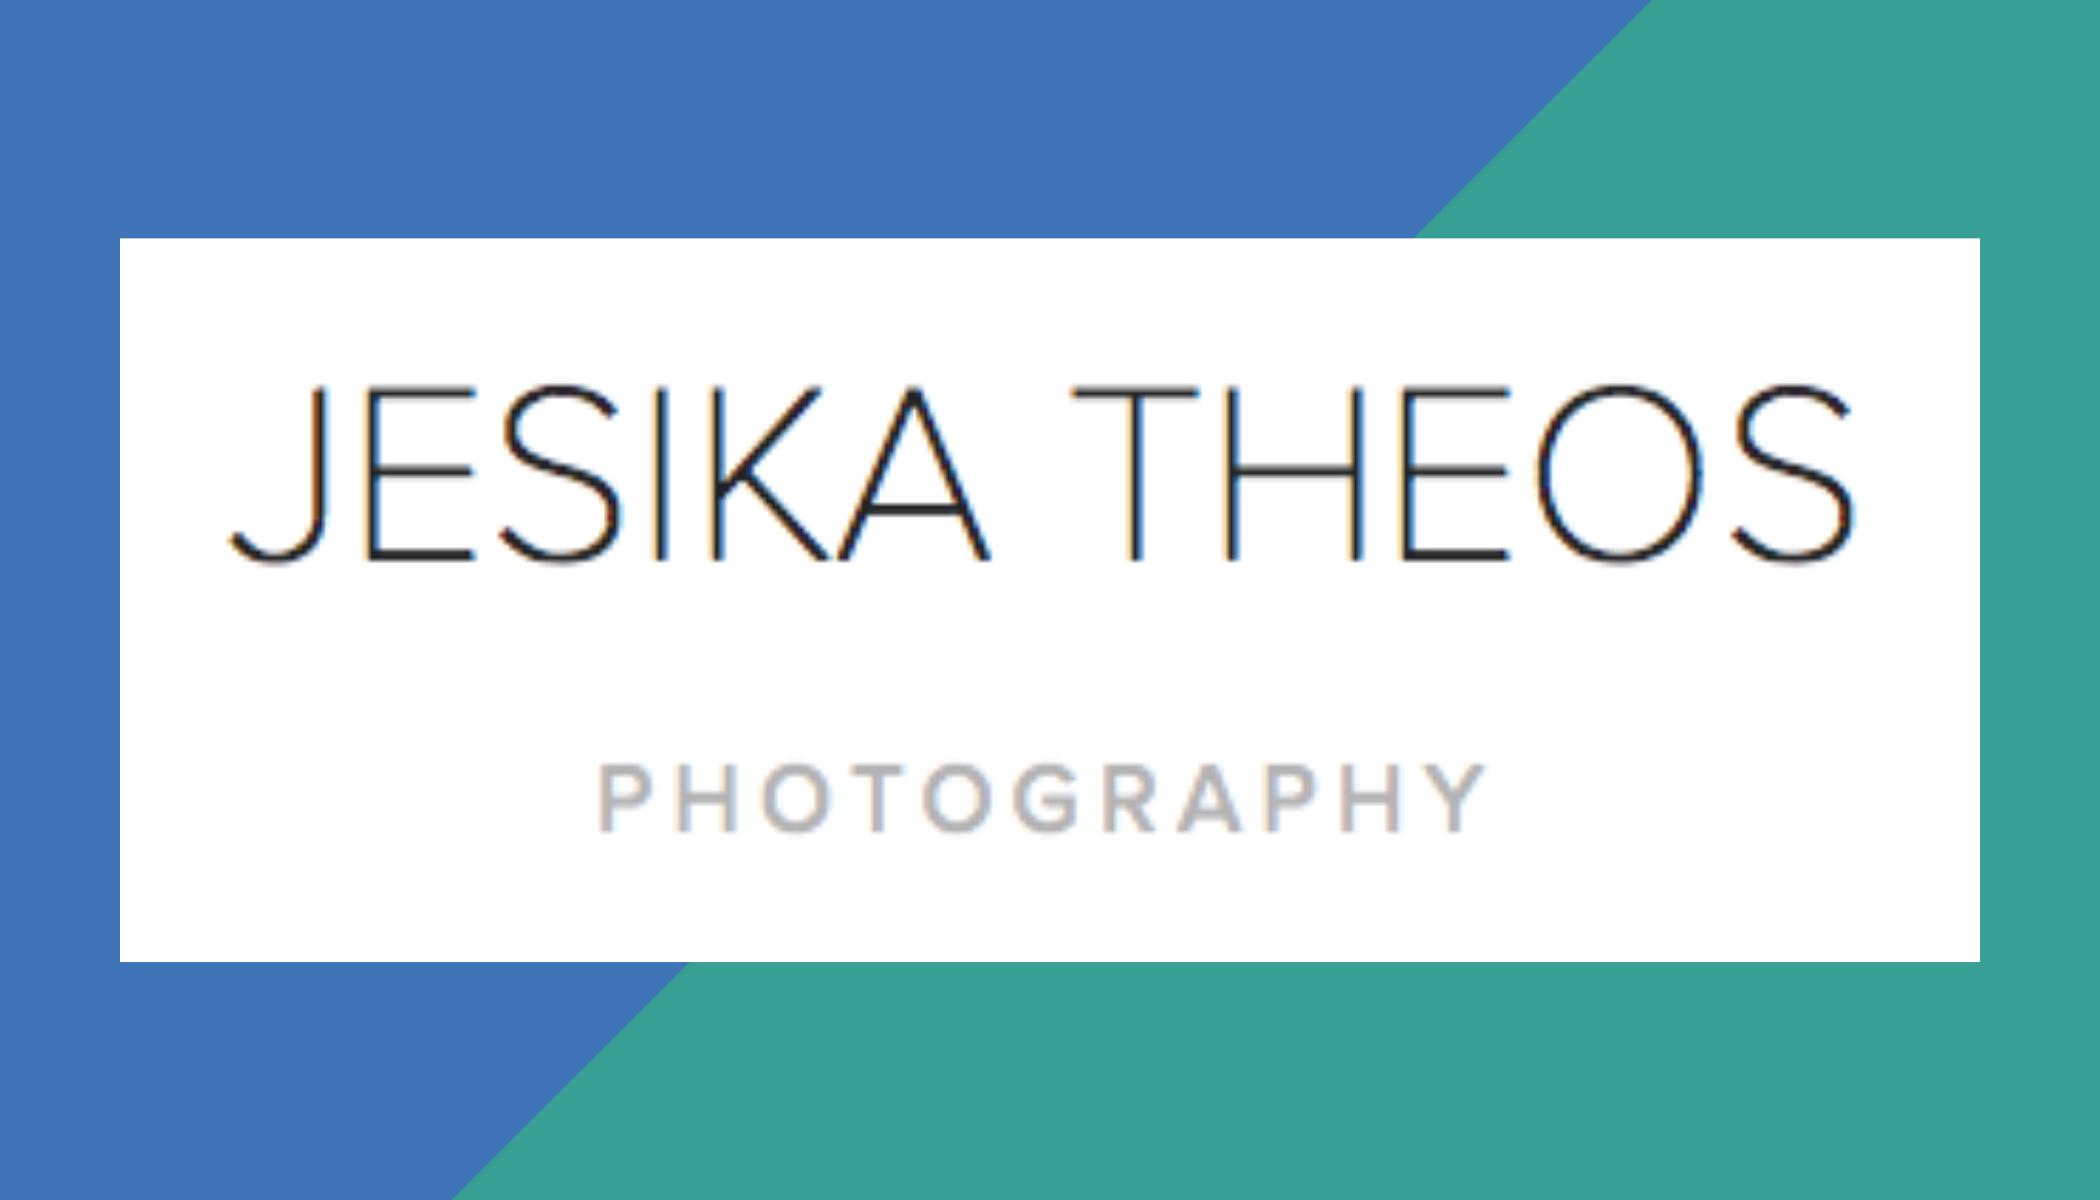 Jesika Theos photography salsa